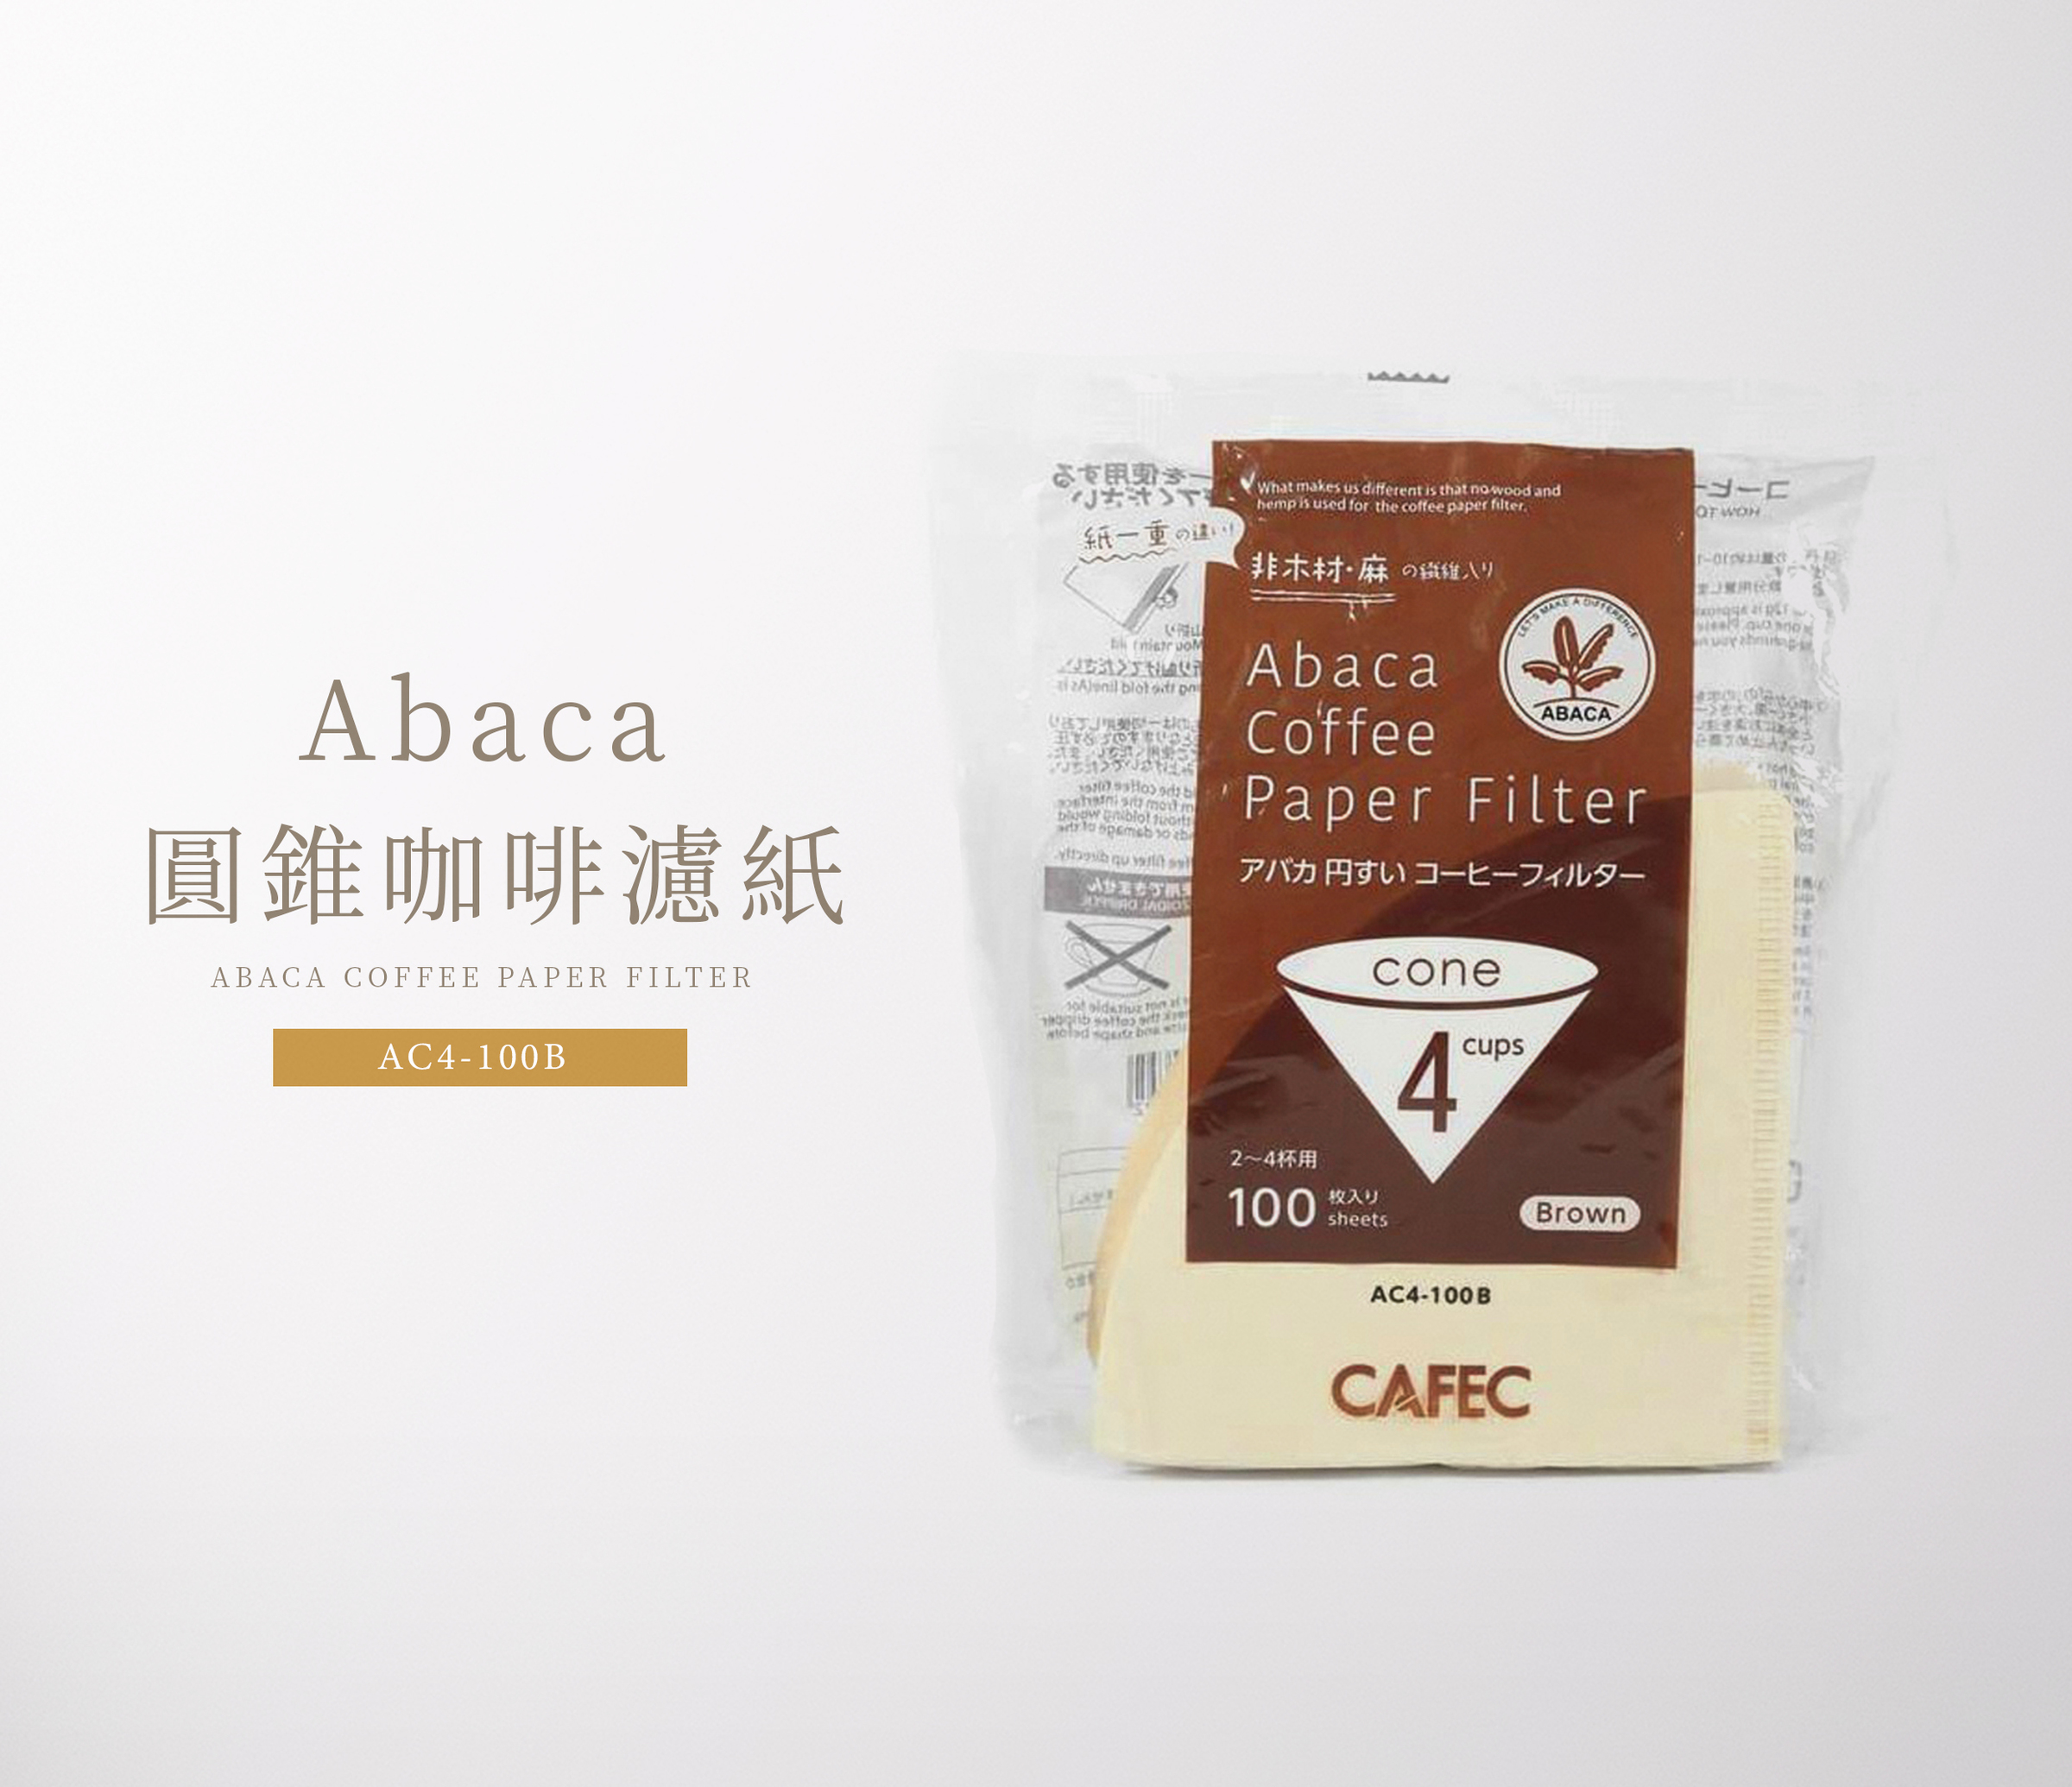 CAFEC V01圓錐咖啡濾紙.jpg